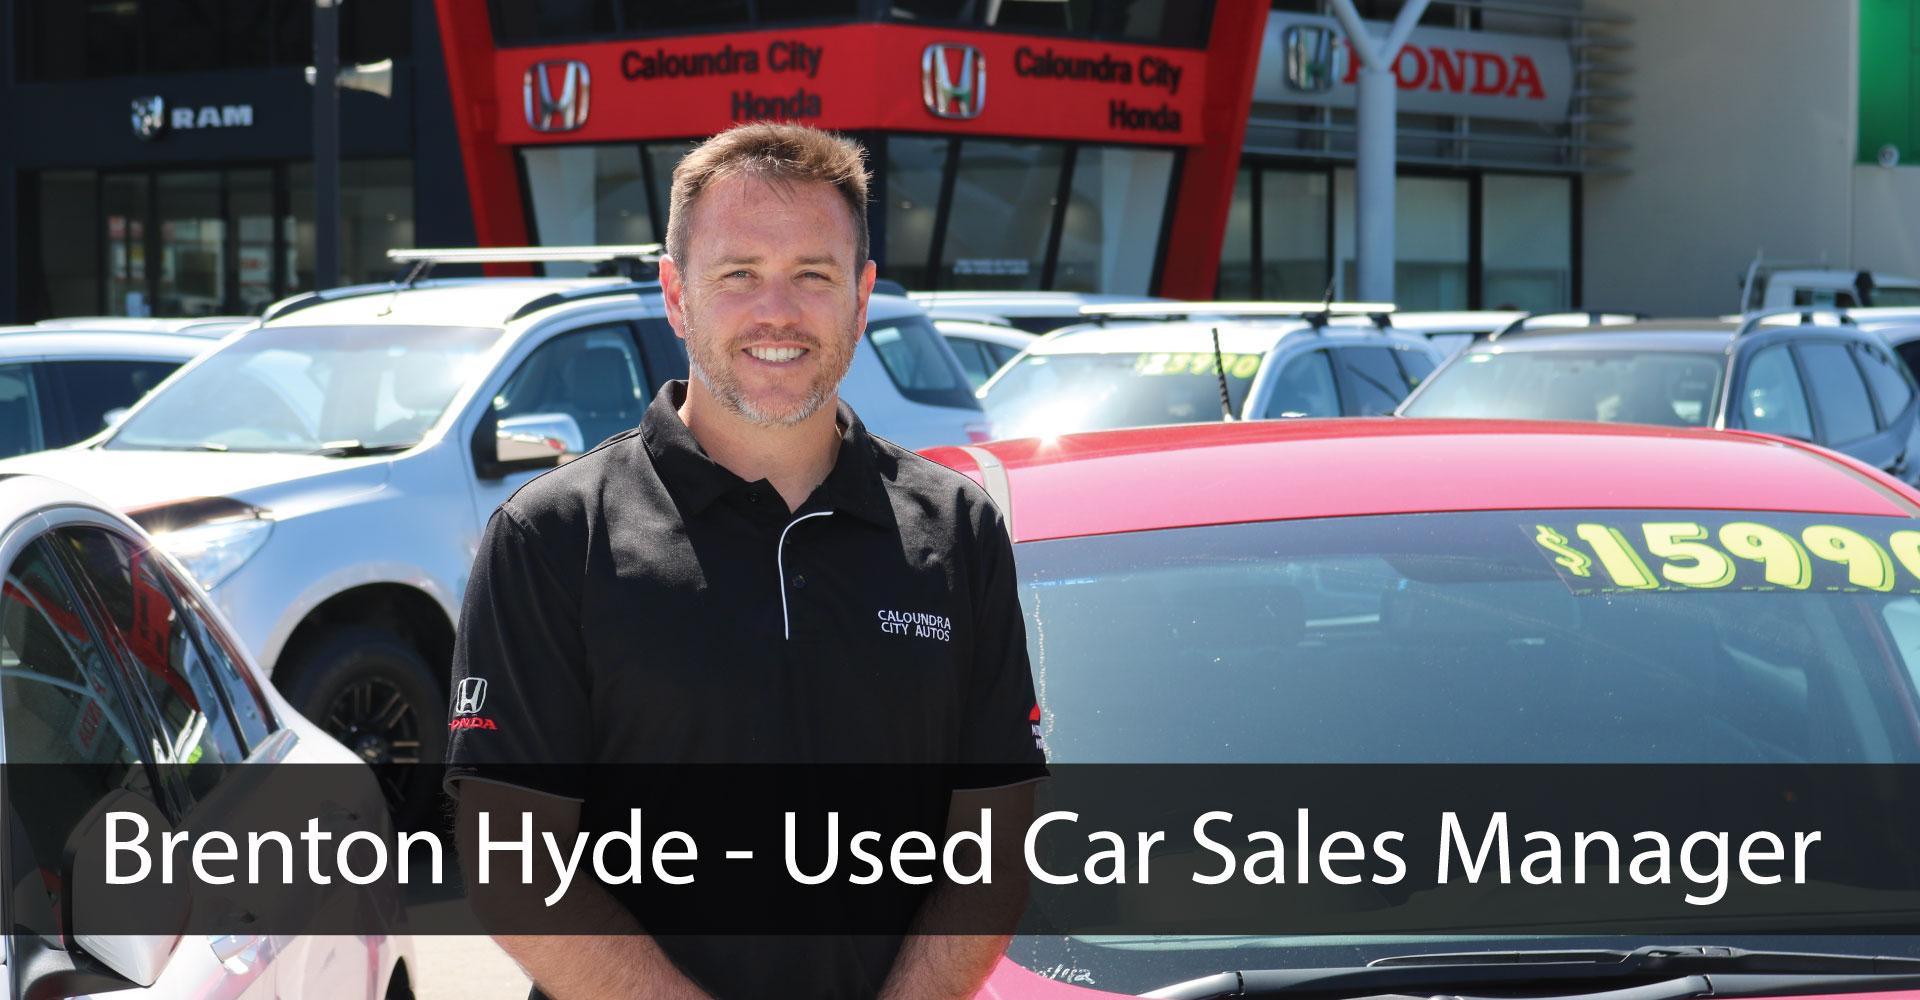 USED CAR DEALS AT CALOUNDRA CITY AUTOS